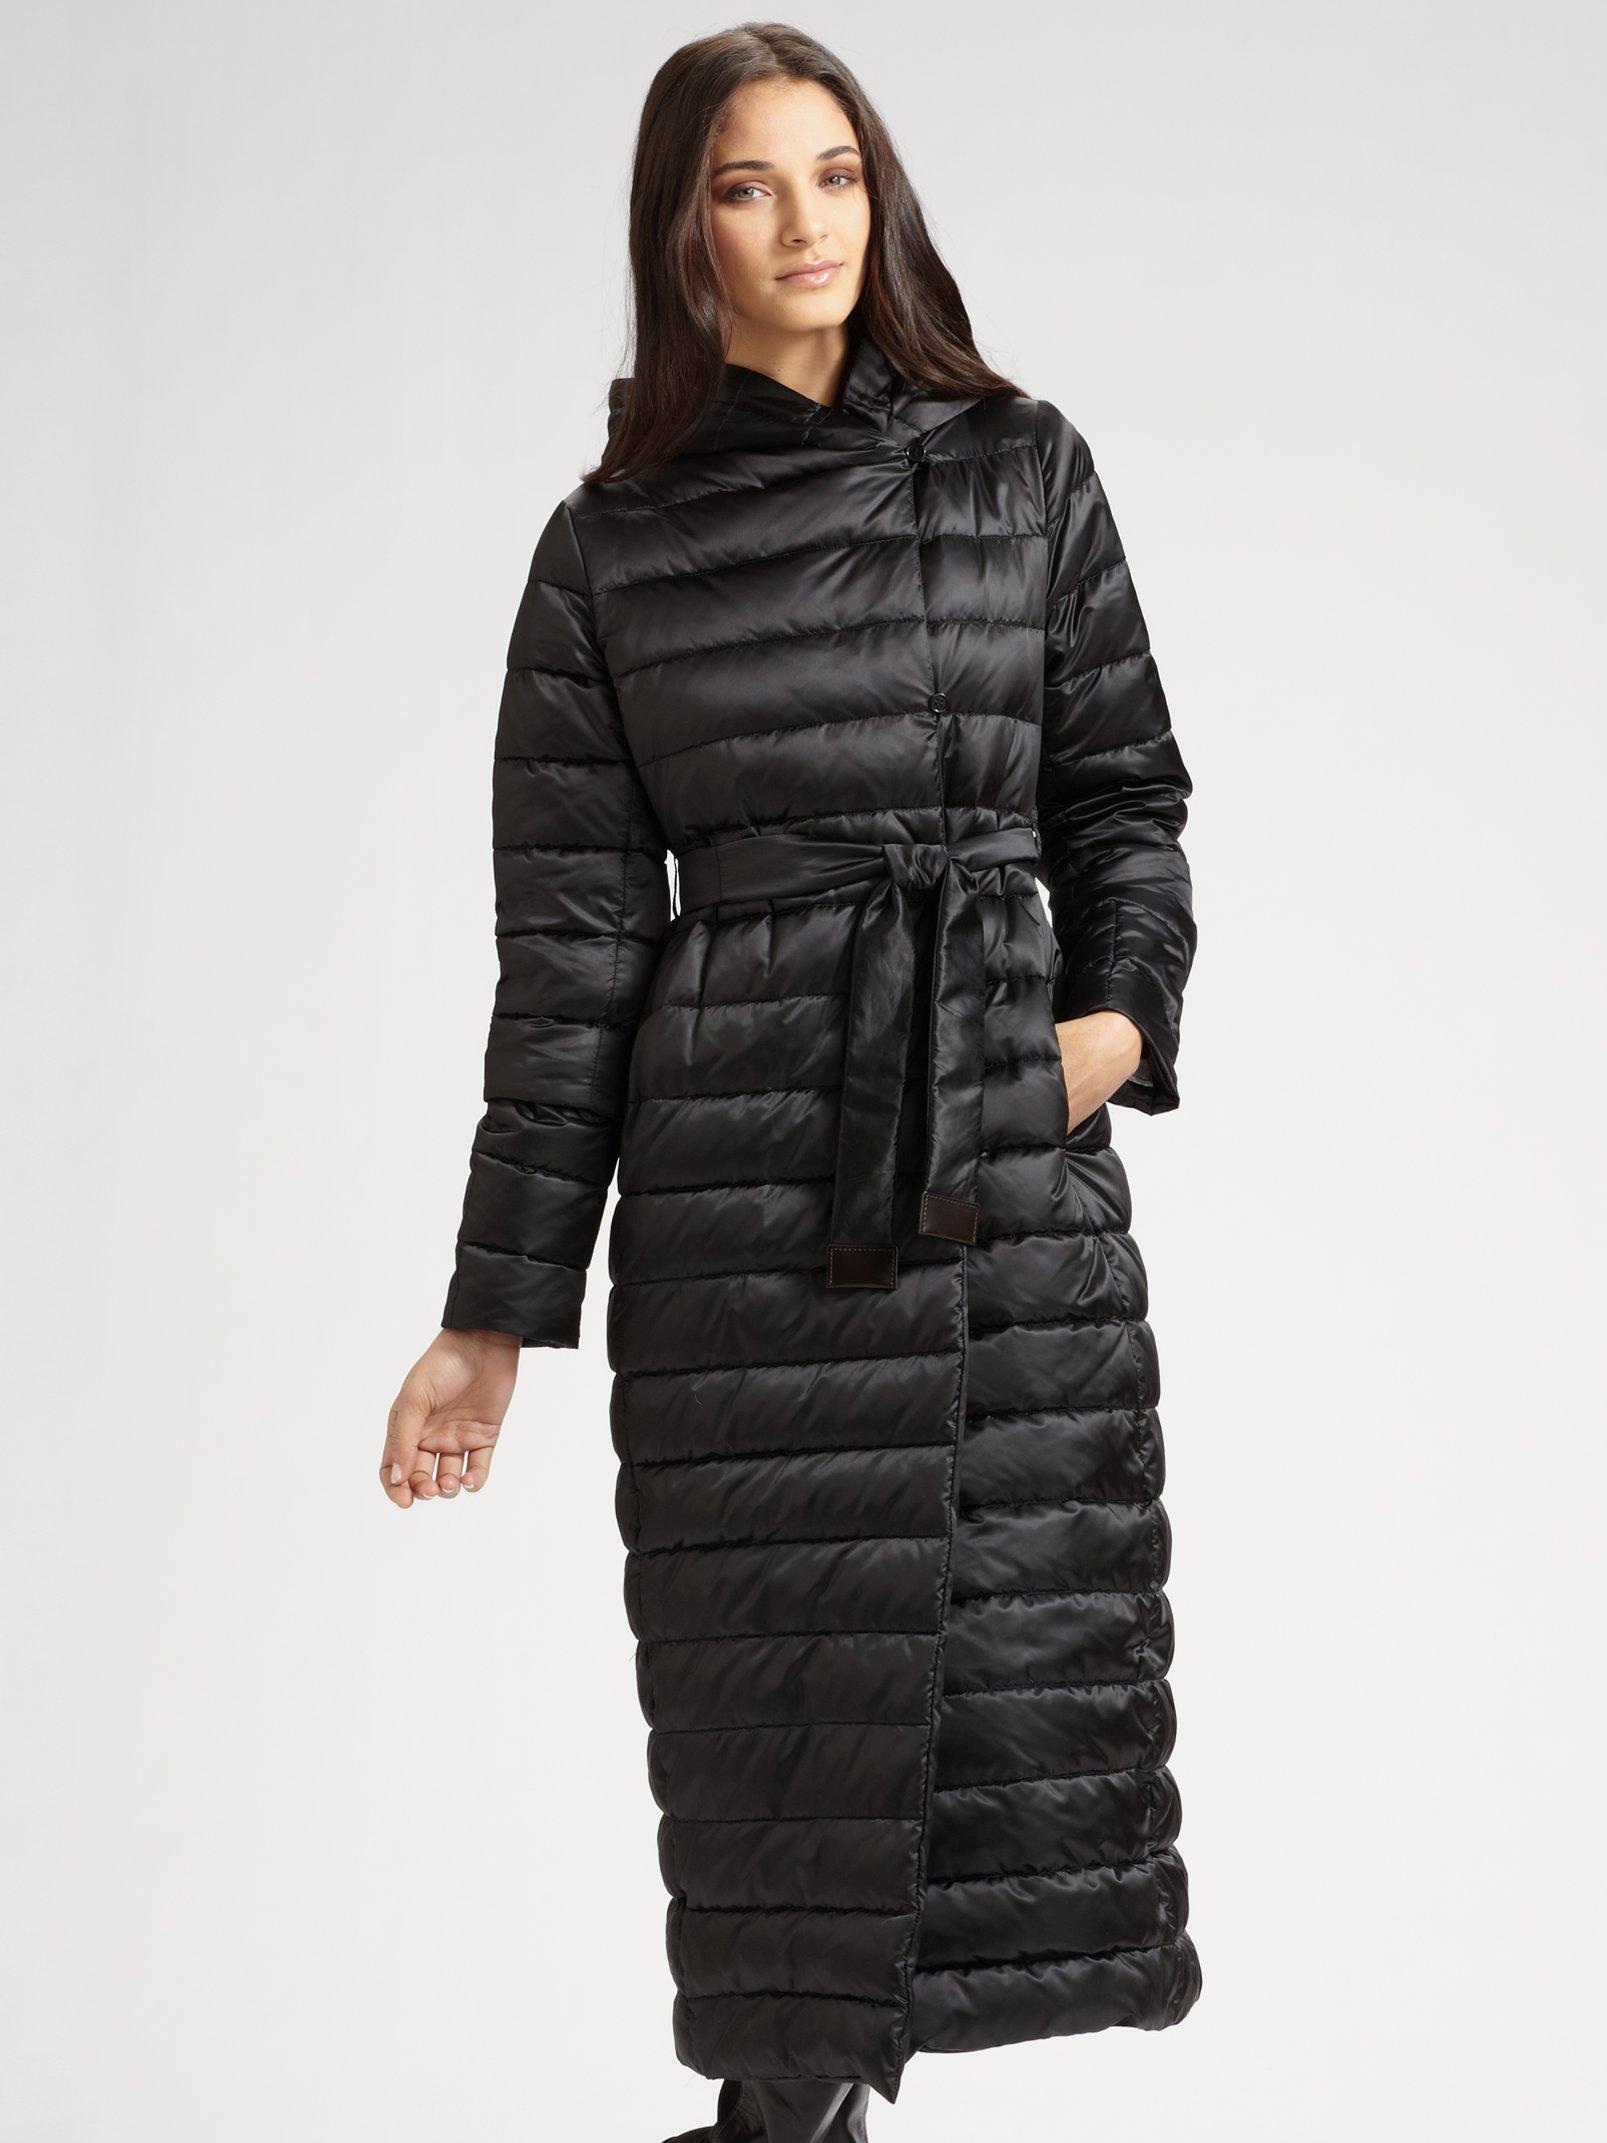 Lyst - Max mara Quilted Coat in Black : max mara quilted jacket - Adamdwight.com